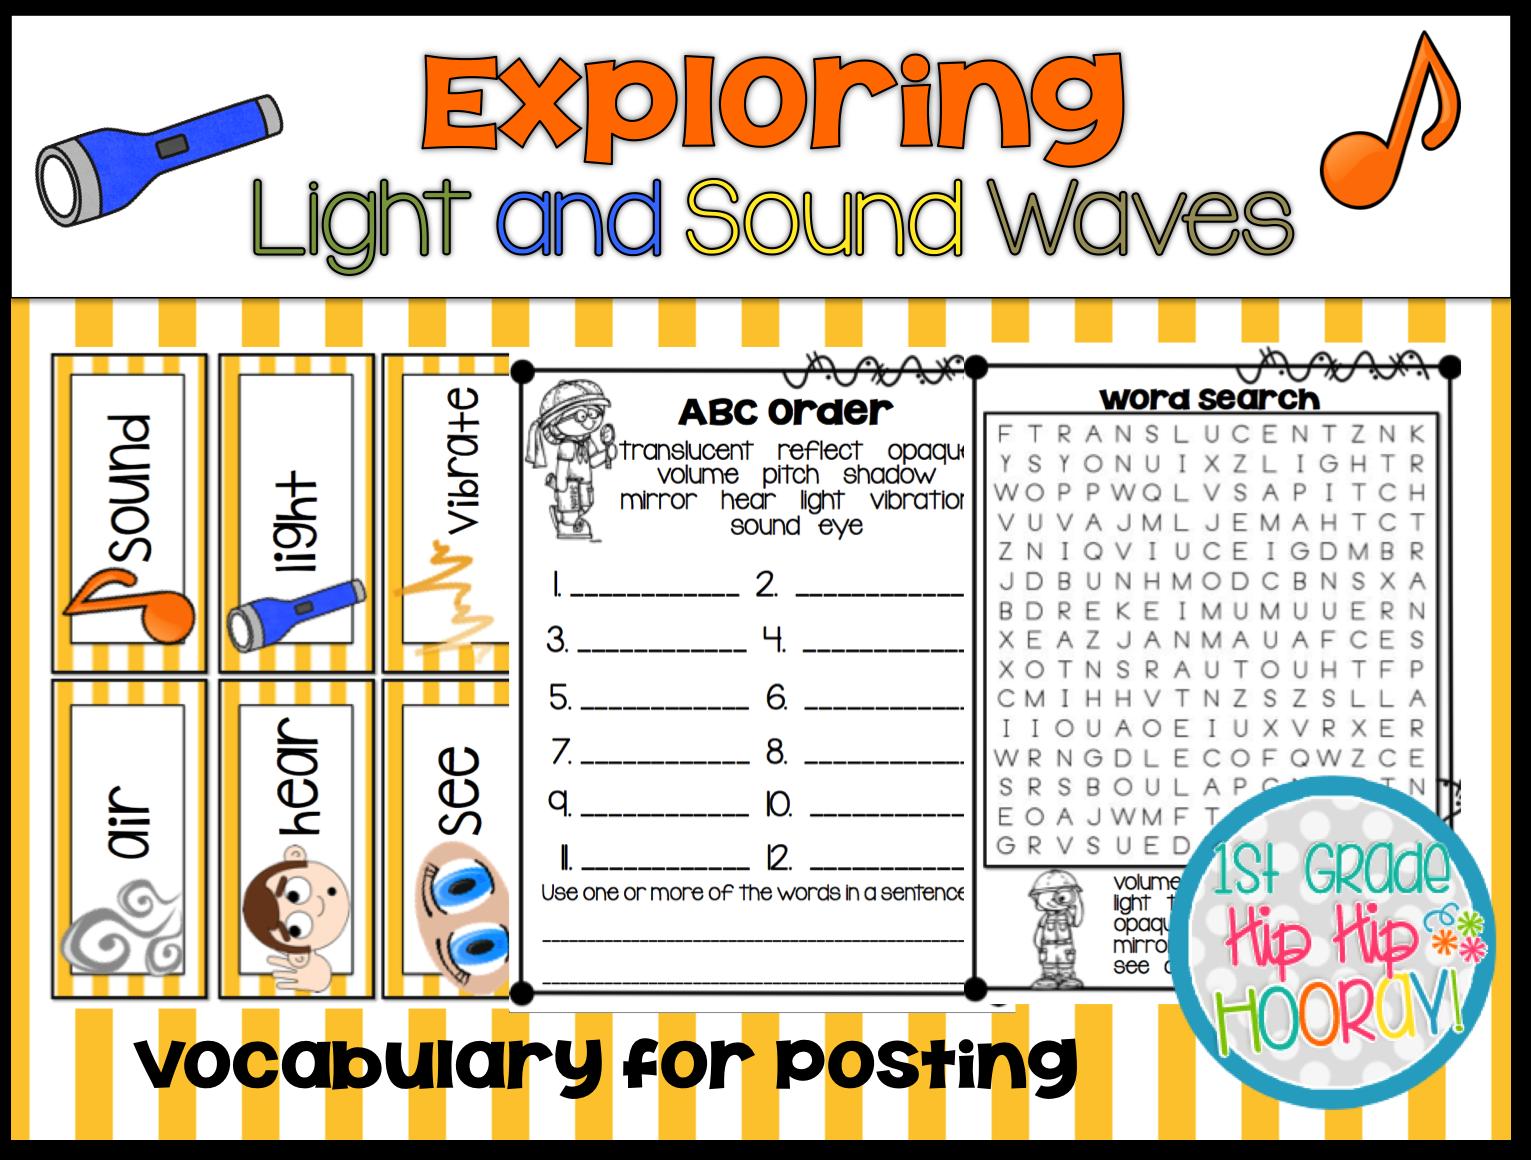 1st Grade Hip Hip Hooray Exploring Light And Sound Waves